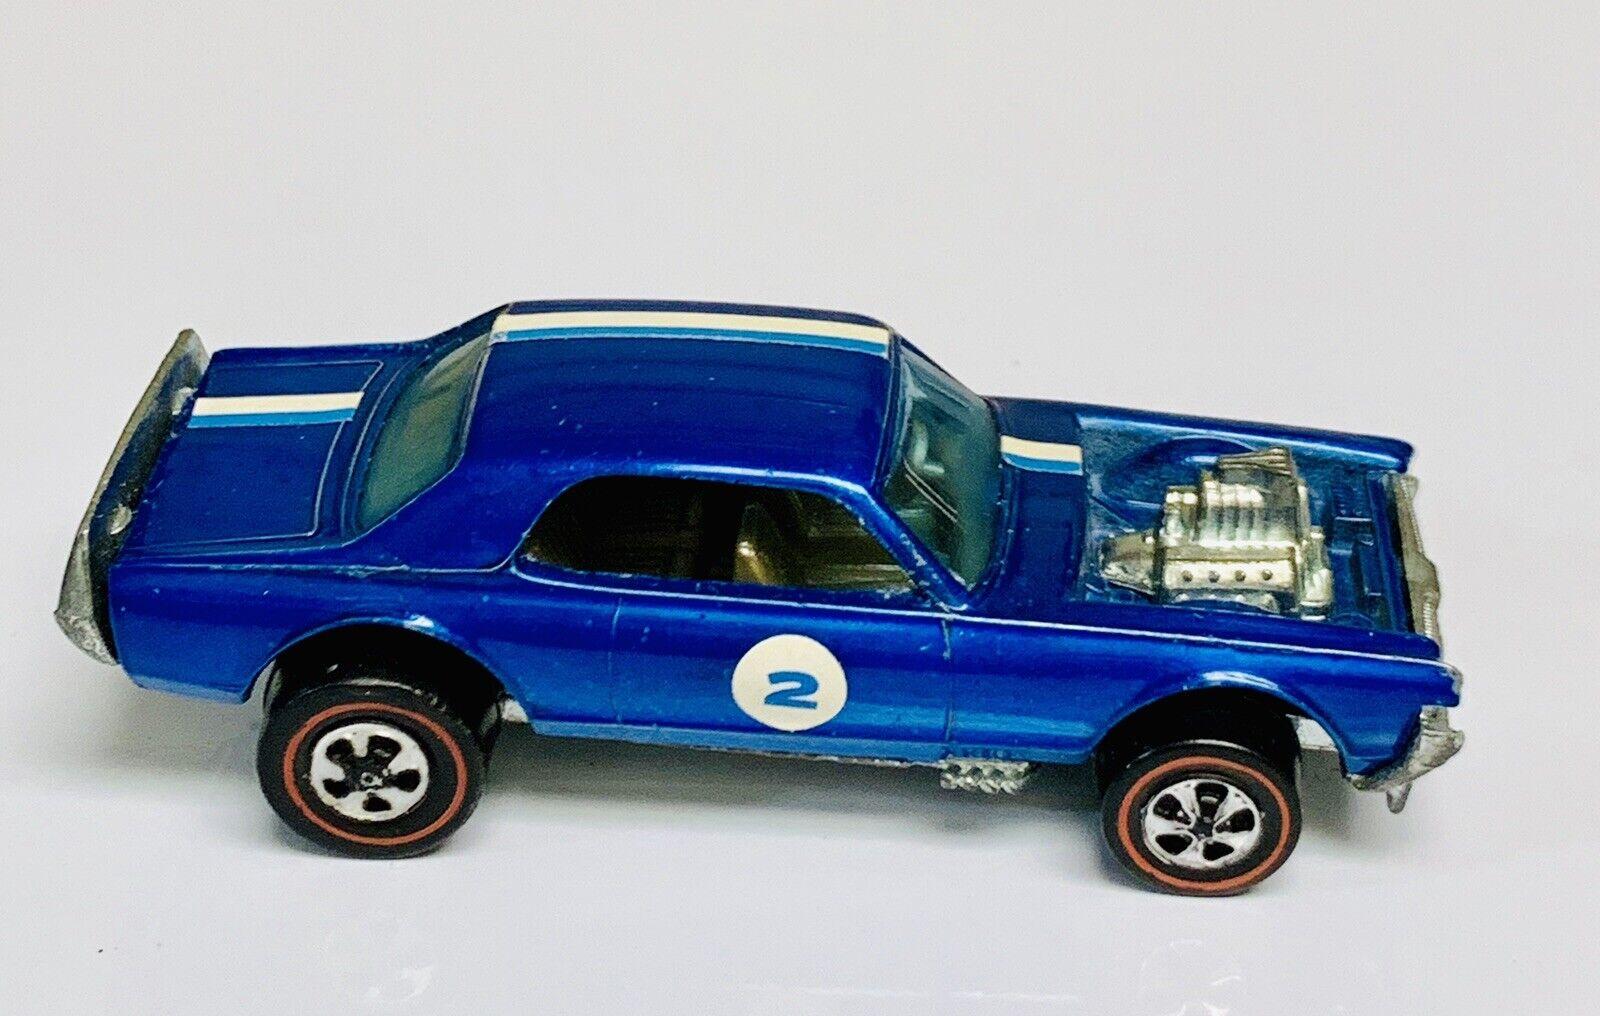 Hot wheels rougeline Bleu spoiler Minty Nitty Gritty Kitty